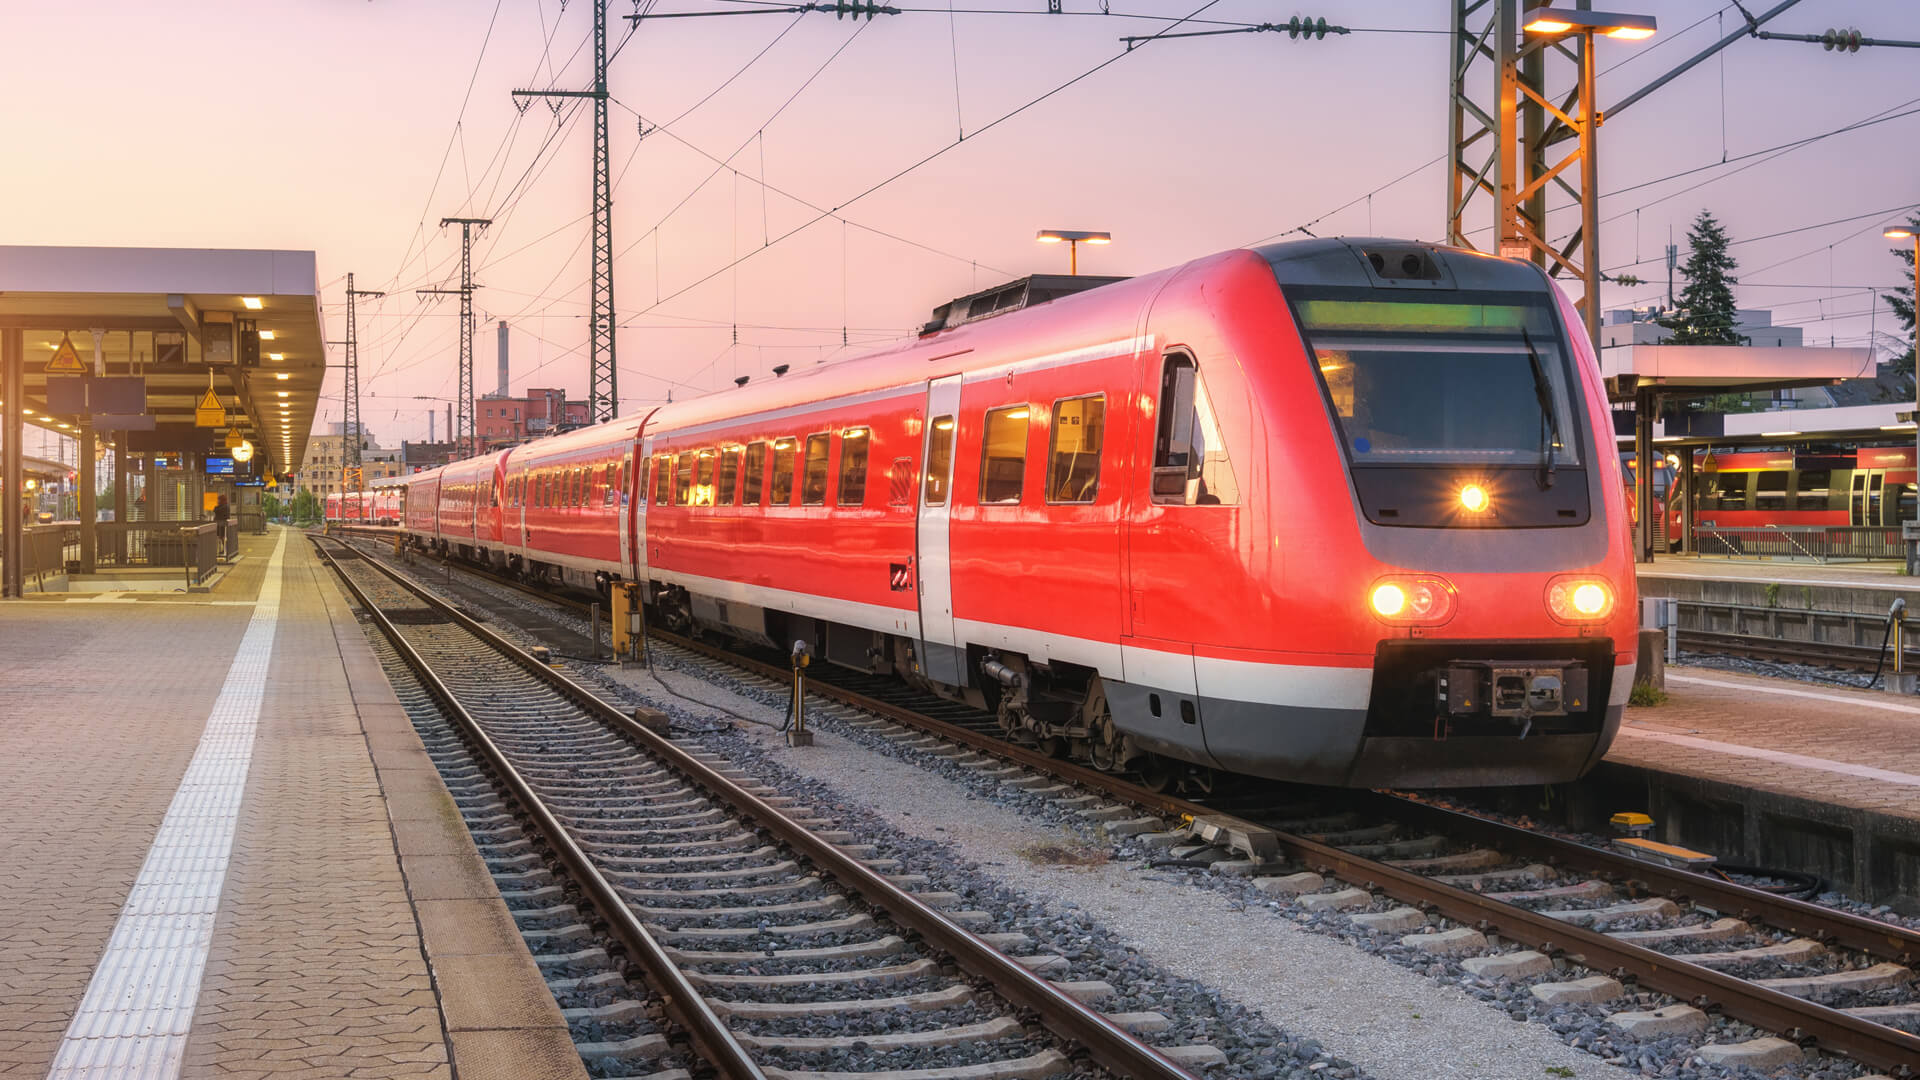 DB Fahrplan & Buchung